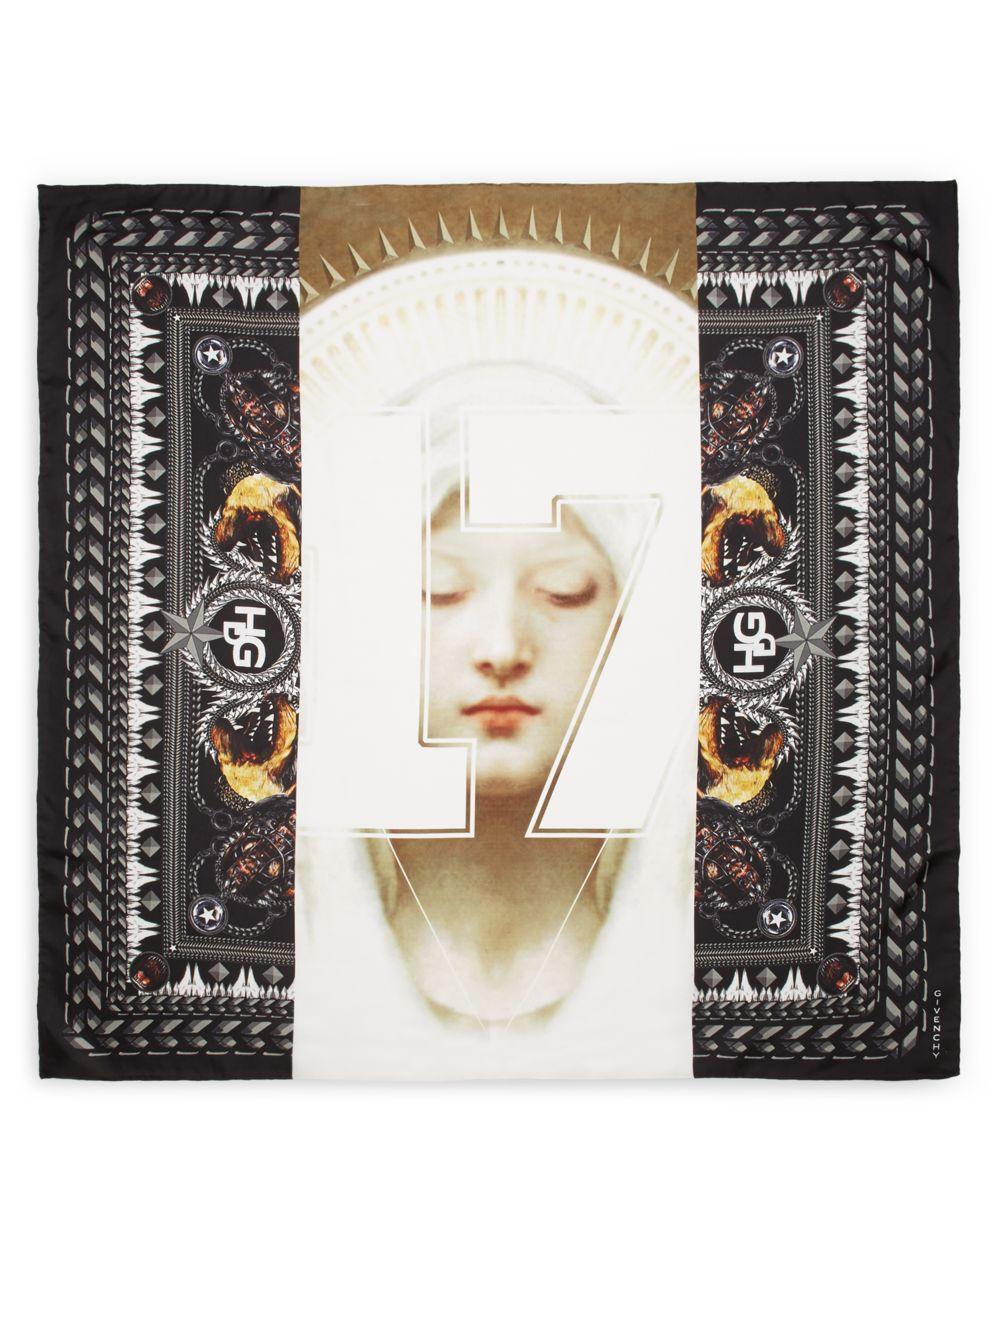 Madonna Givenchy Givenchy Madonna Imprimir Imprimir bufanda wqgtxYZ